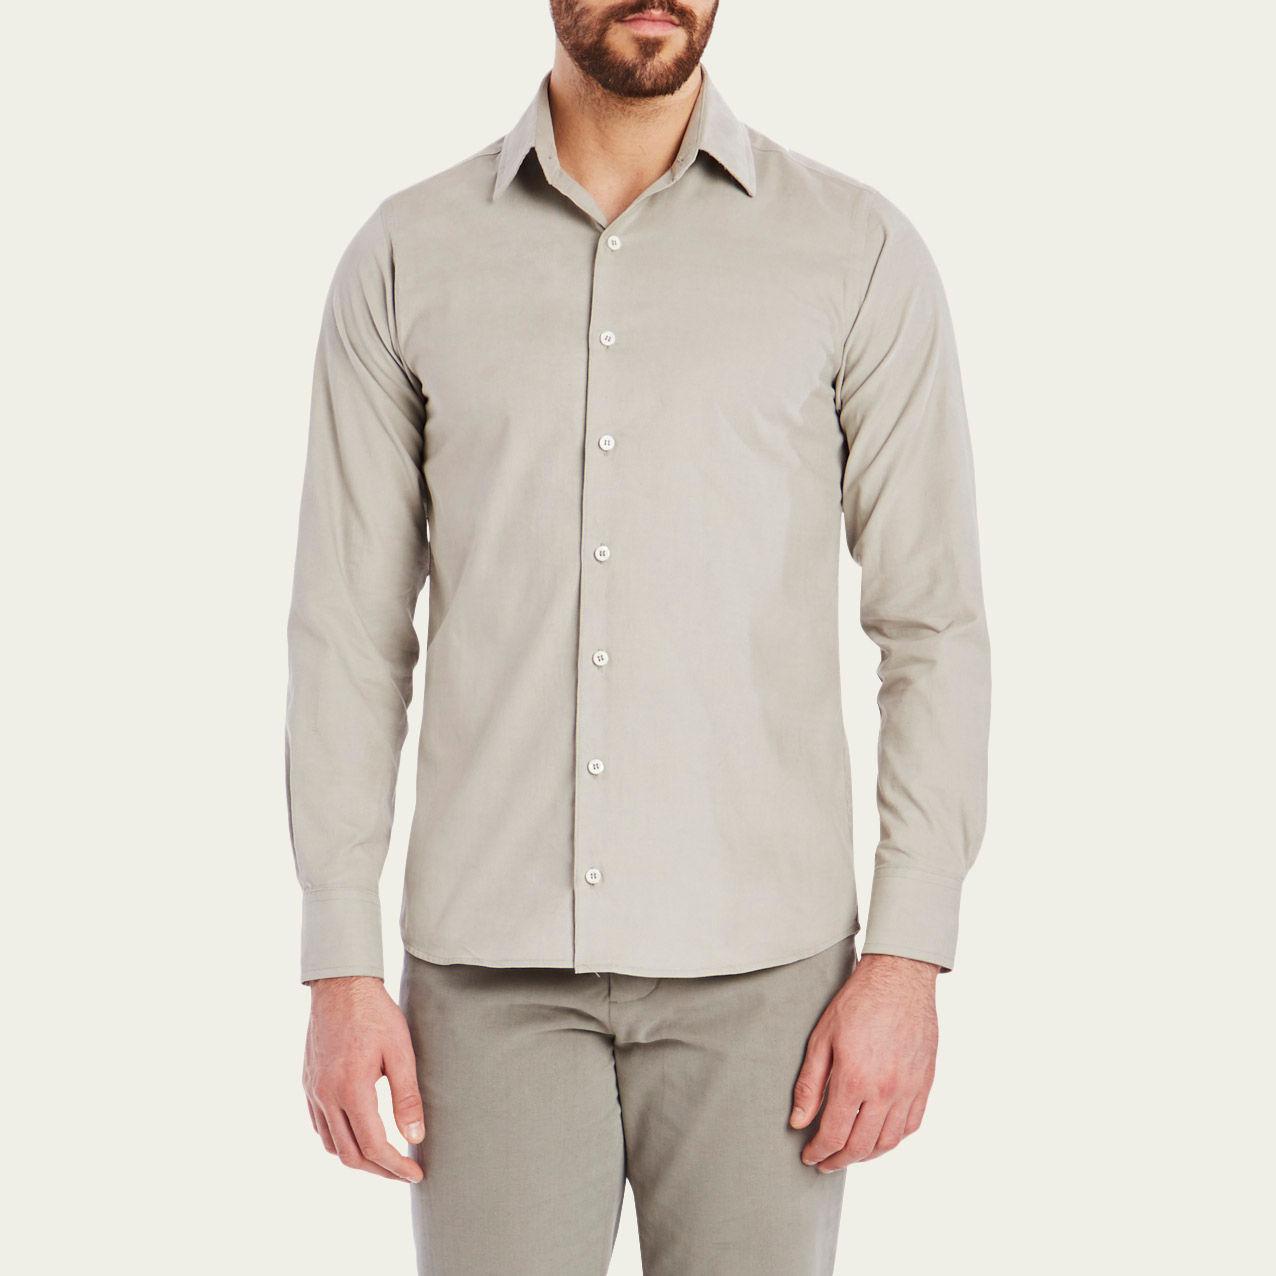 Mushroom Cord Plain Collar Shirt 1